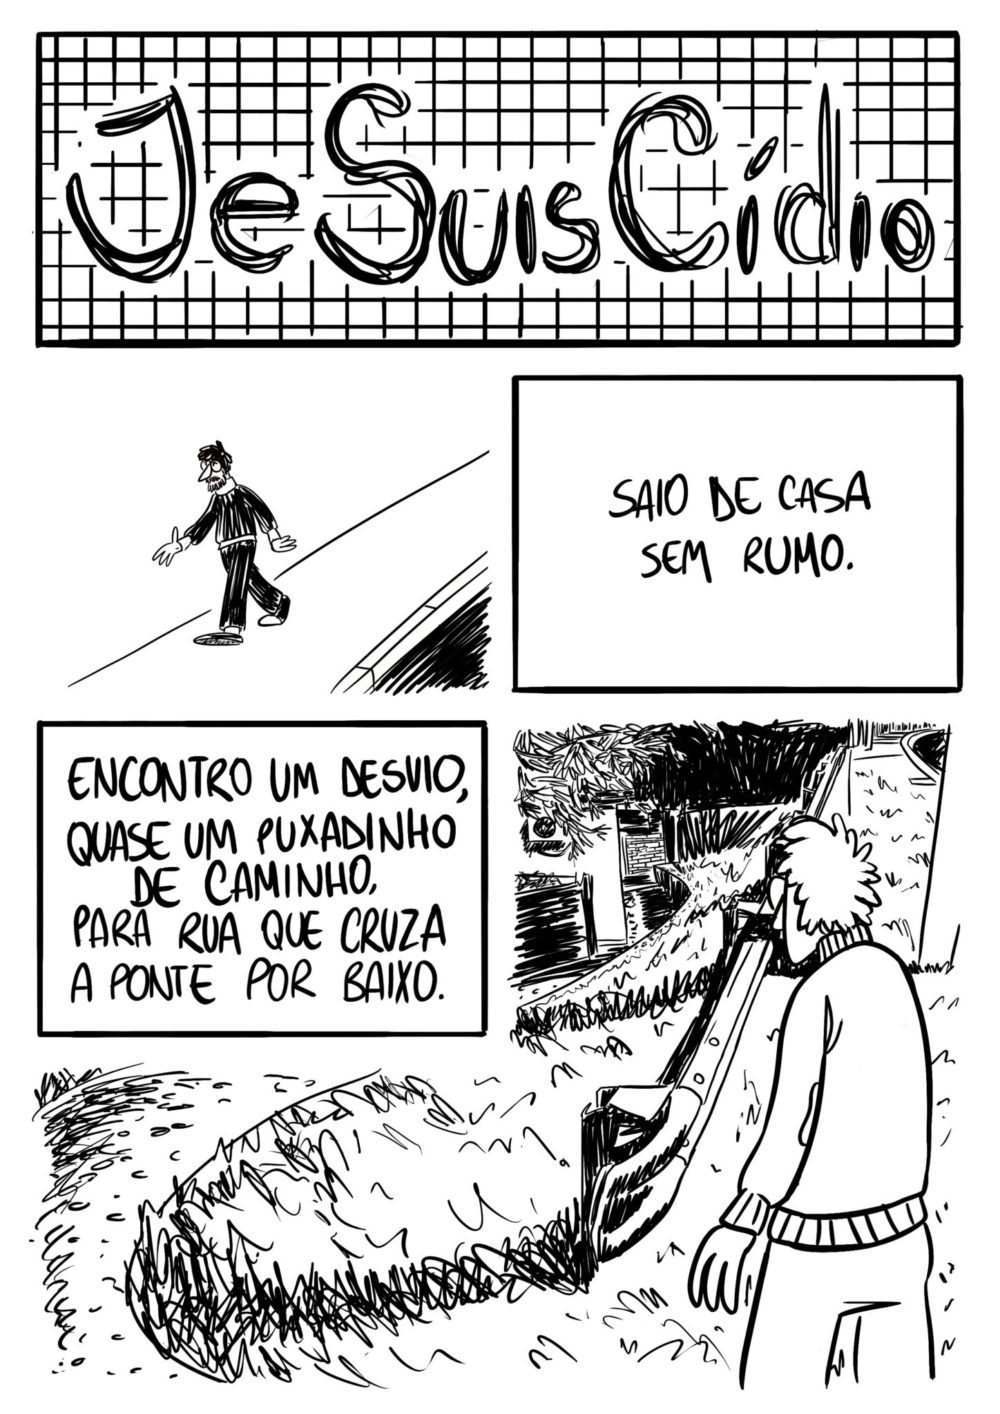 Je Suis Cídio #6, por João B. Godoi